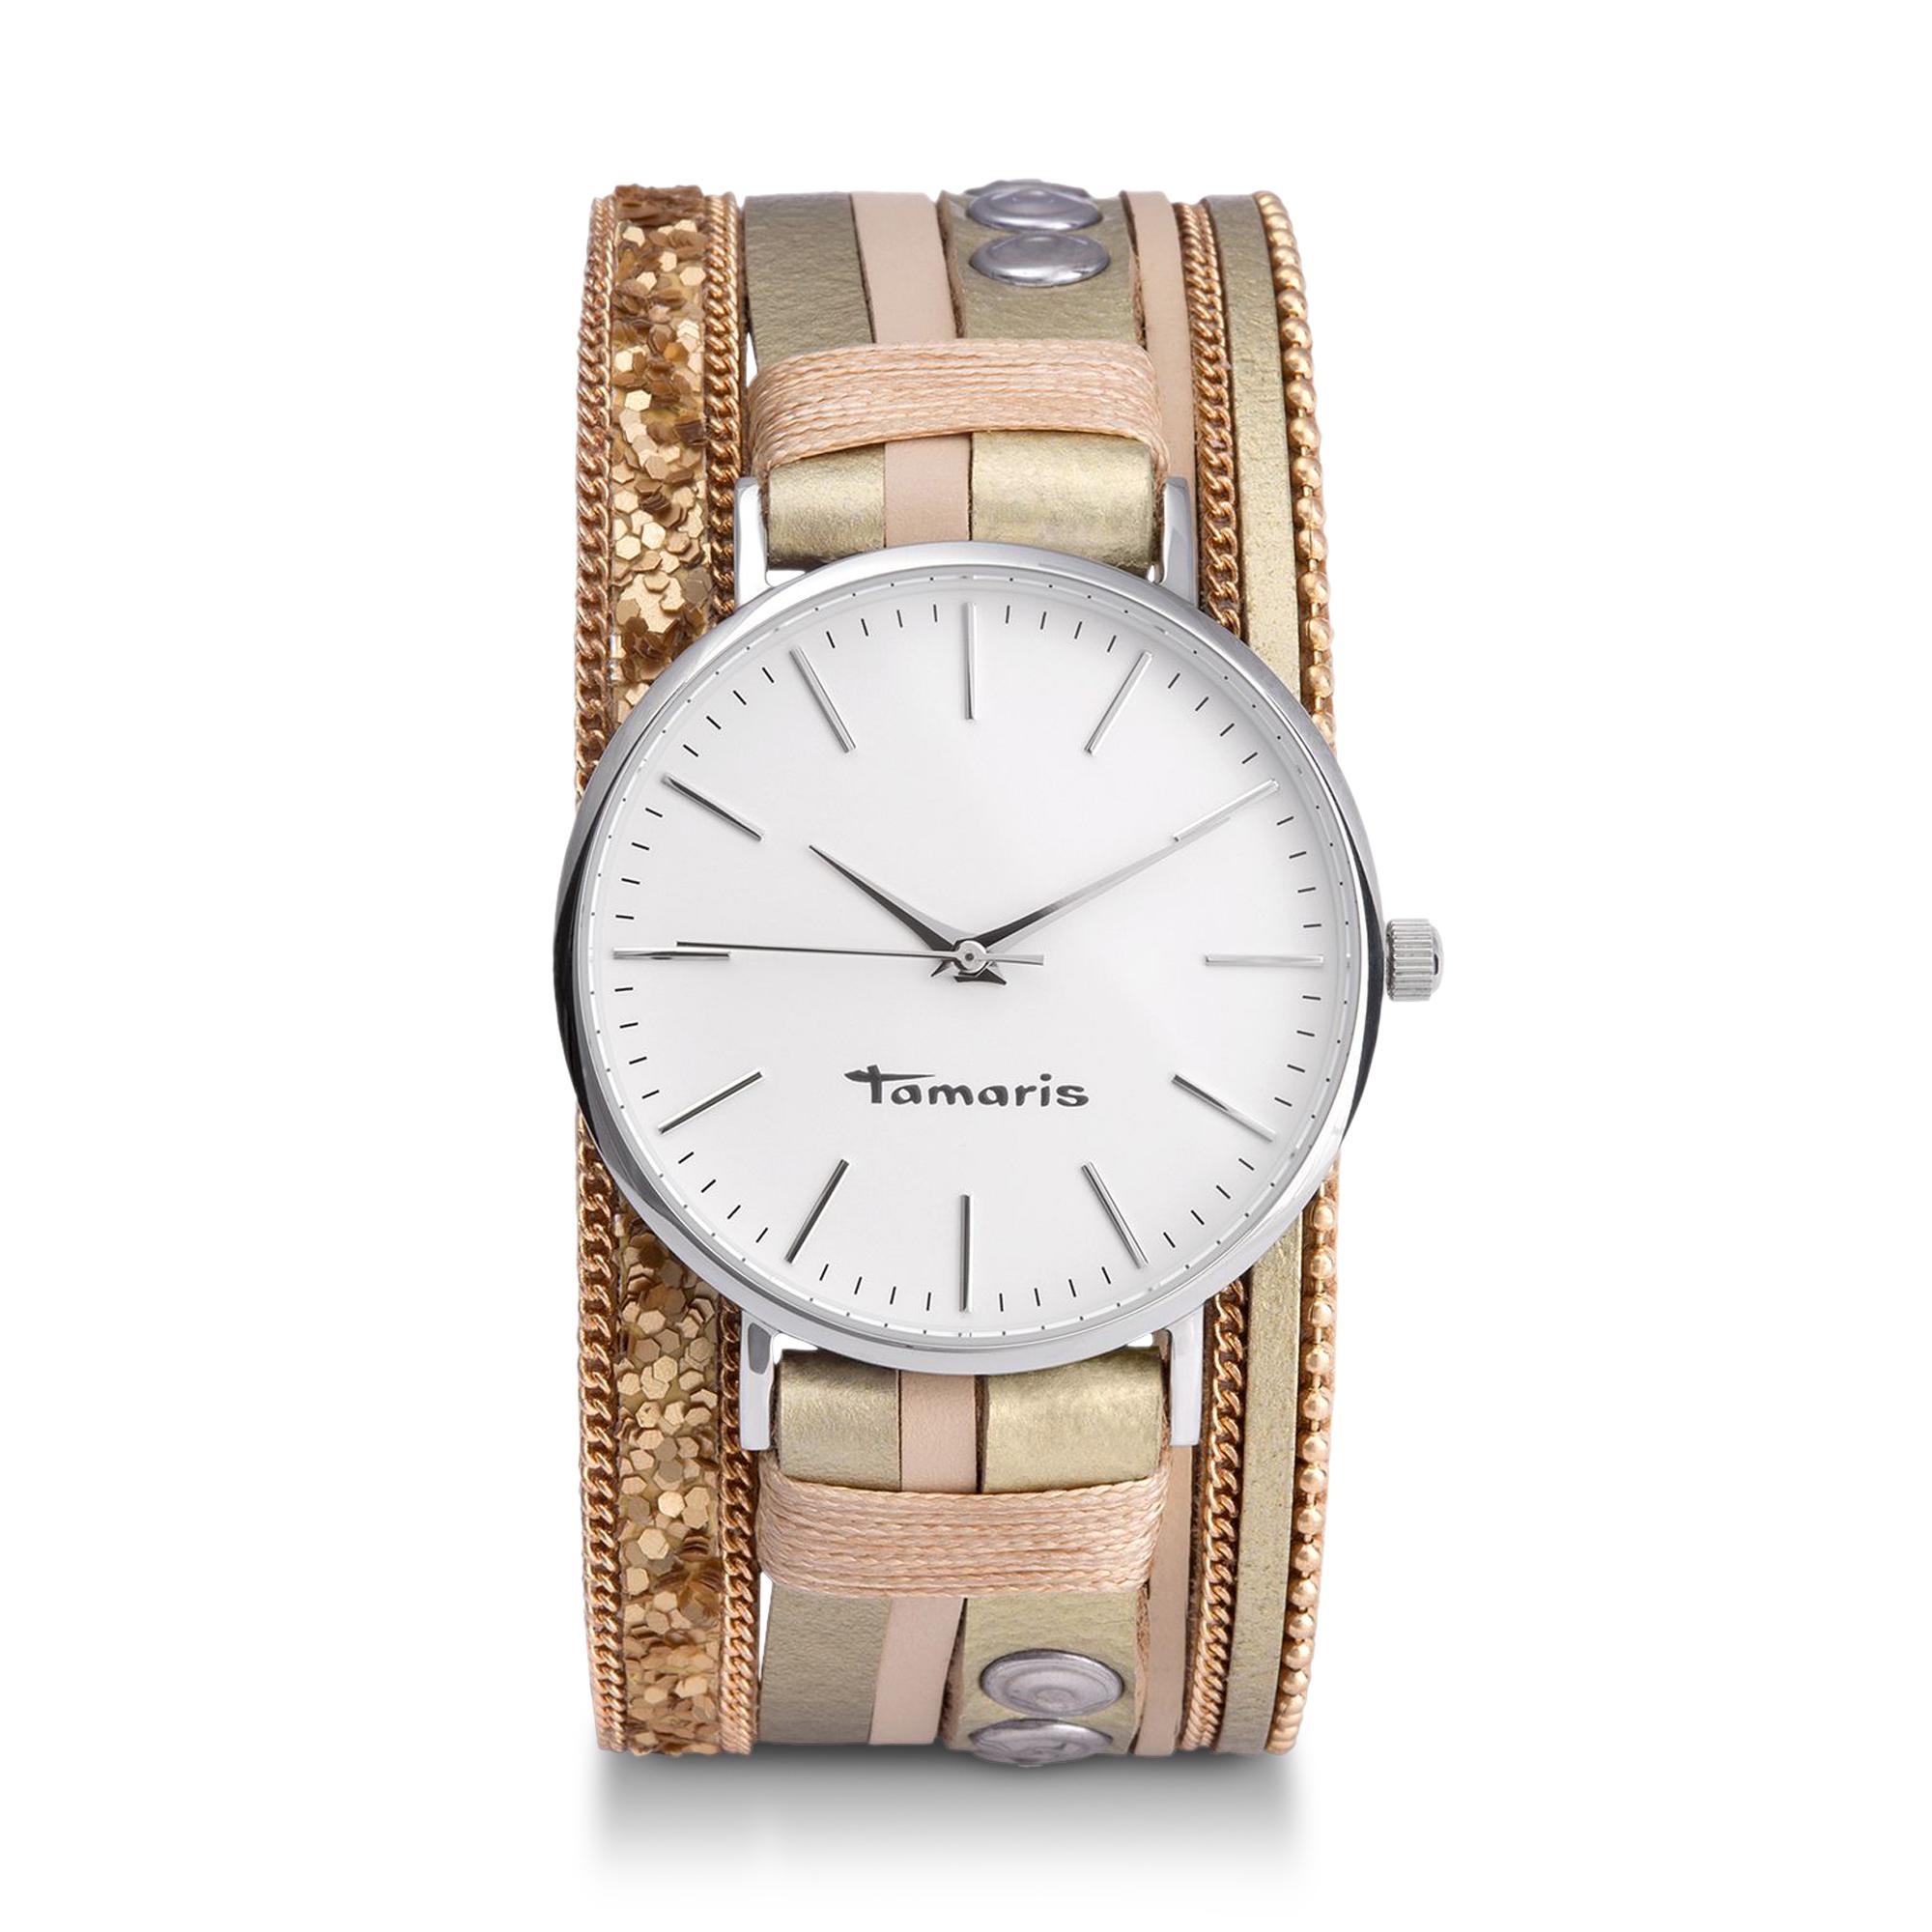 Wortmann Uhren e12028000 100 one size tamaris uhren kaufen